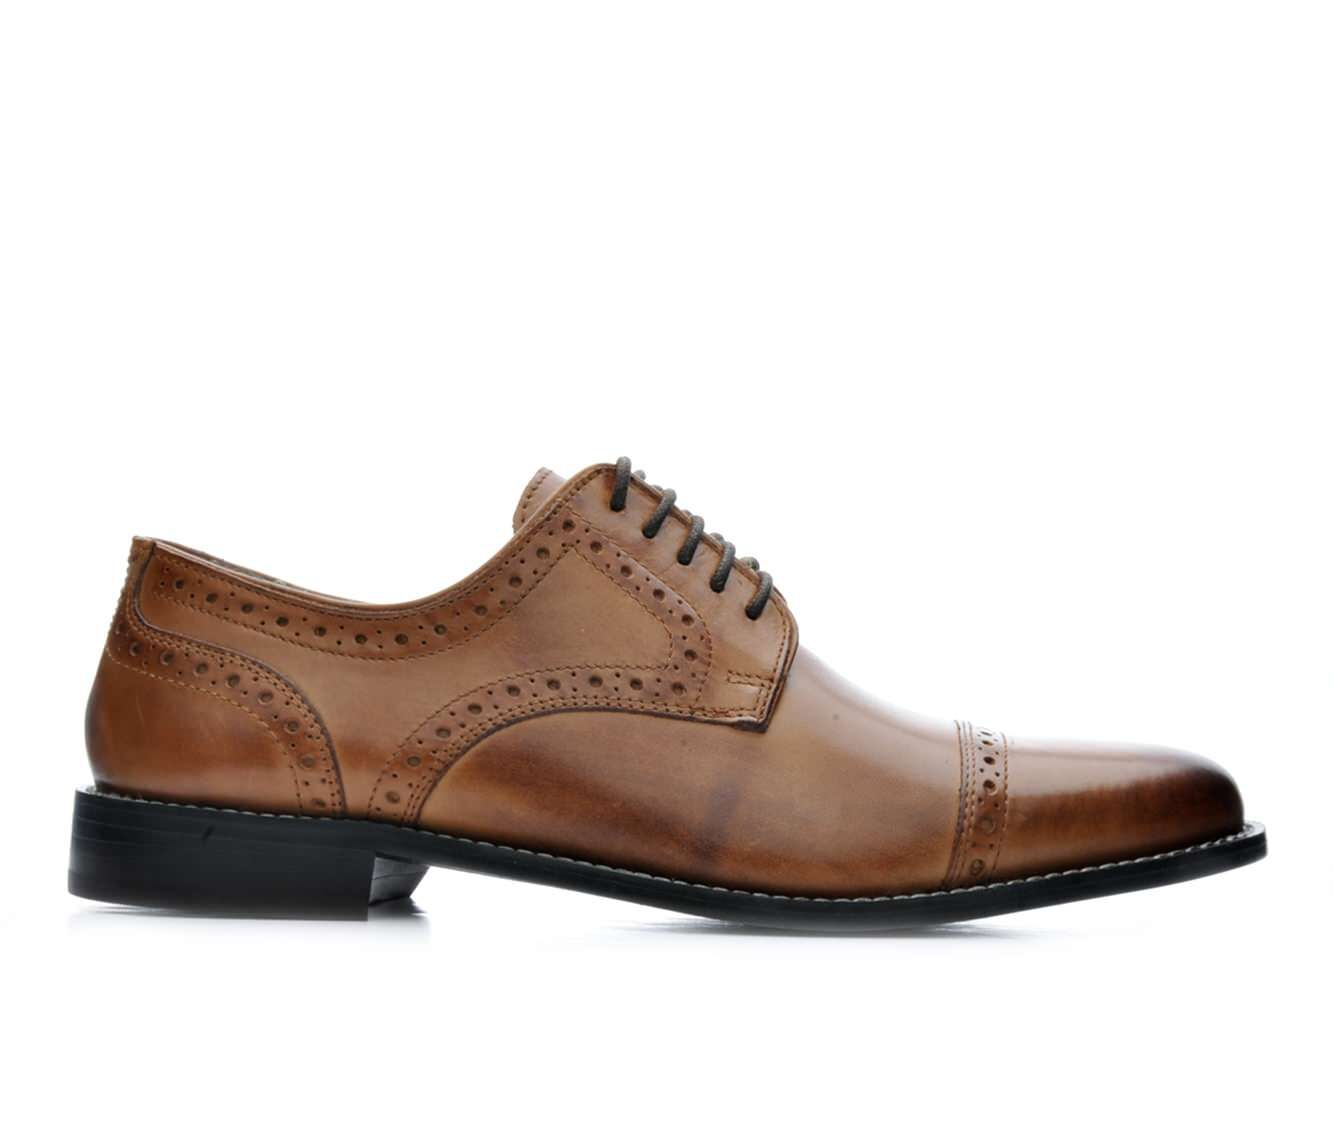 The Most Popular Men's Nunn Bush Norcross Cap Ox Dress Shoes Cognac